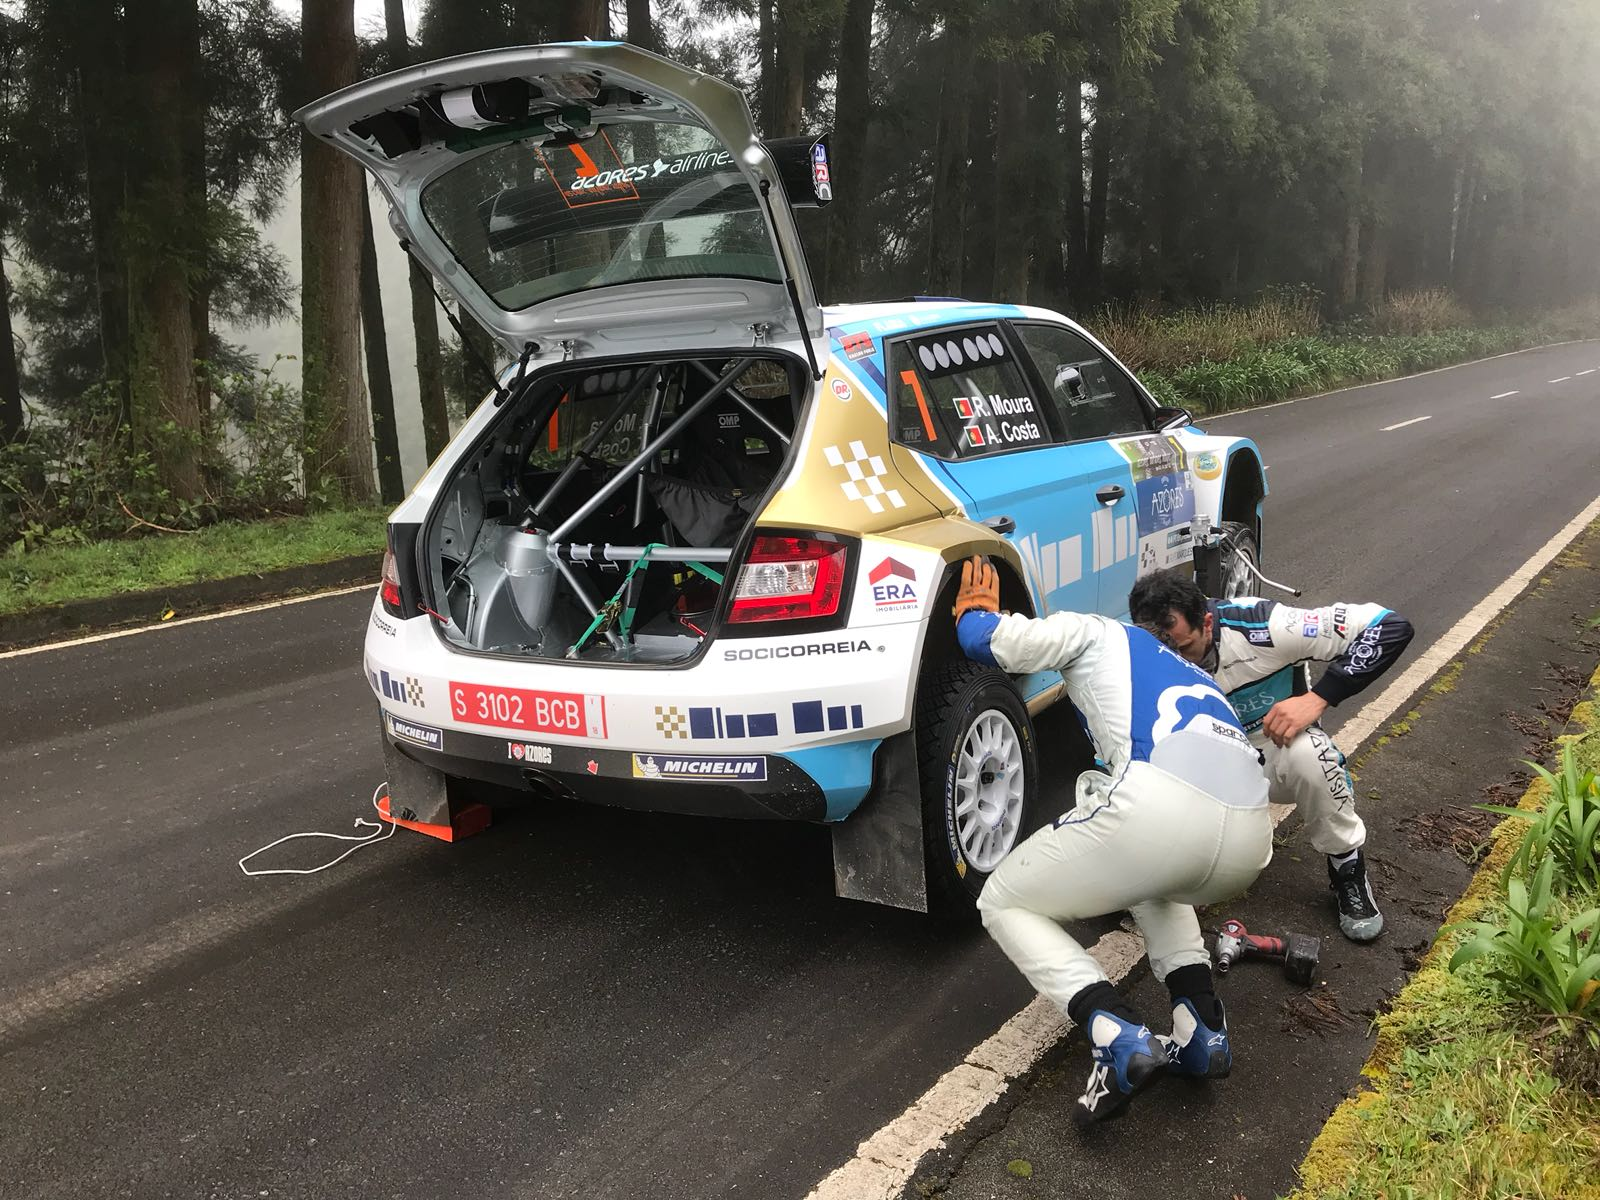 ERC: 53º Azores Airlines Rallye [22-24 Marzo] - Página 3 DY-UUrqW0AAN0GS